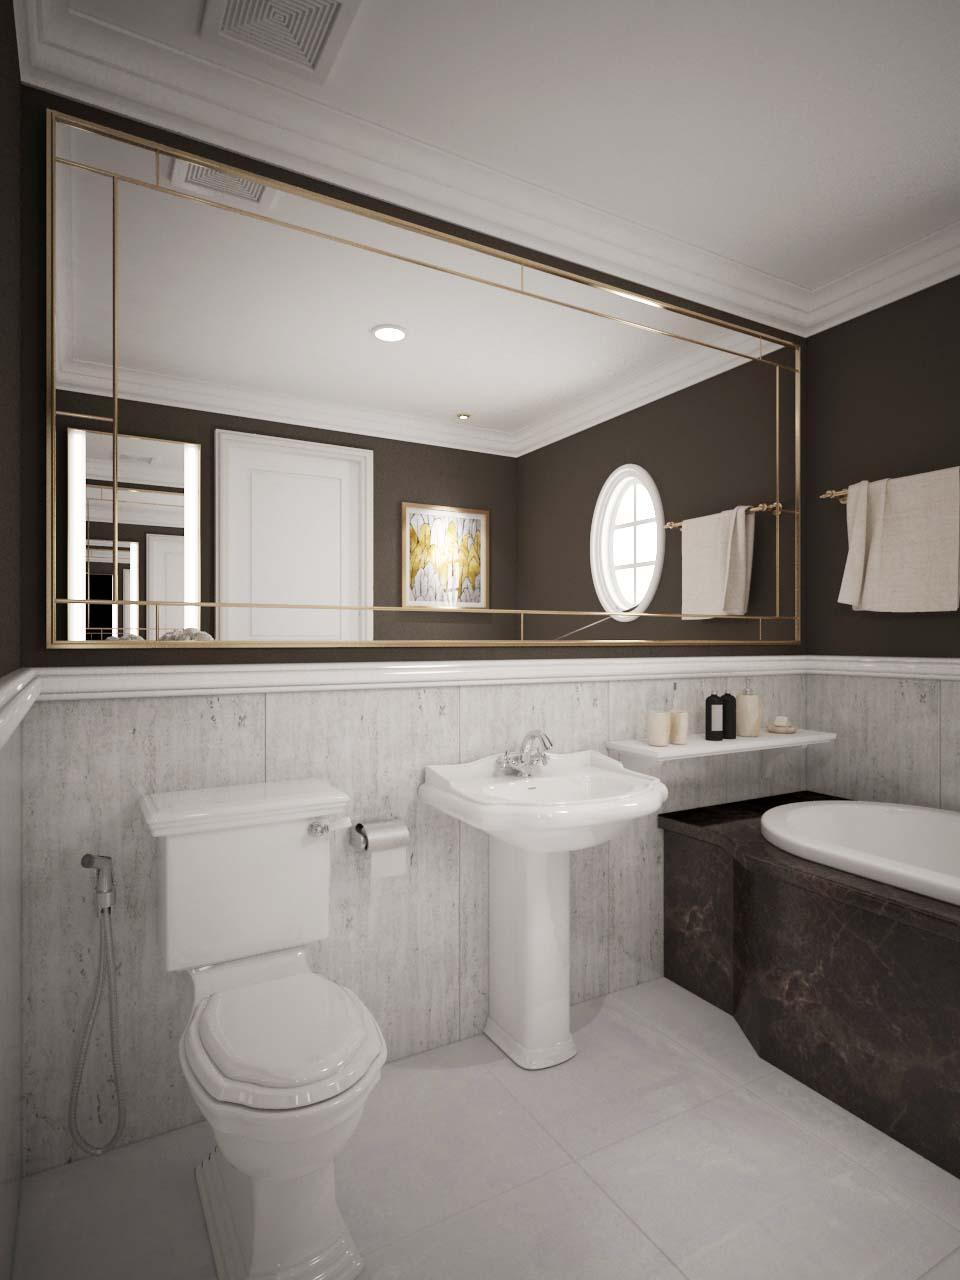 Interior-Puri-Wargasatwa-Lt.2-Master-Bathroom-A_1.jpg